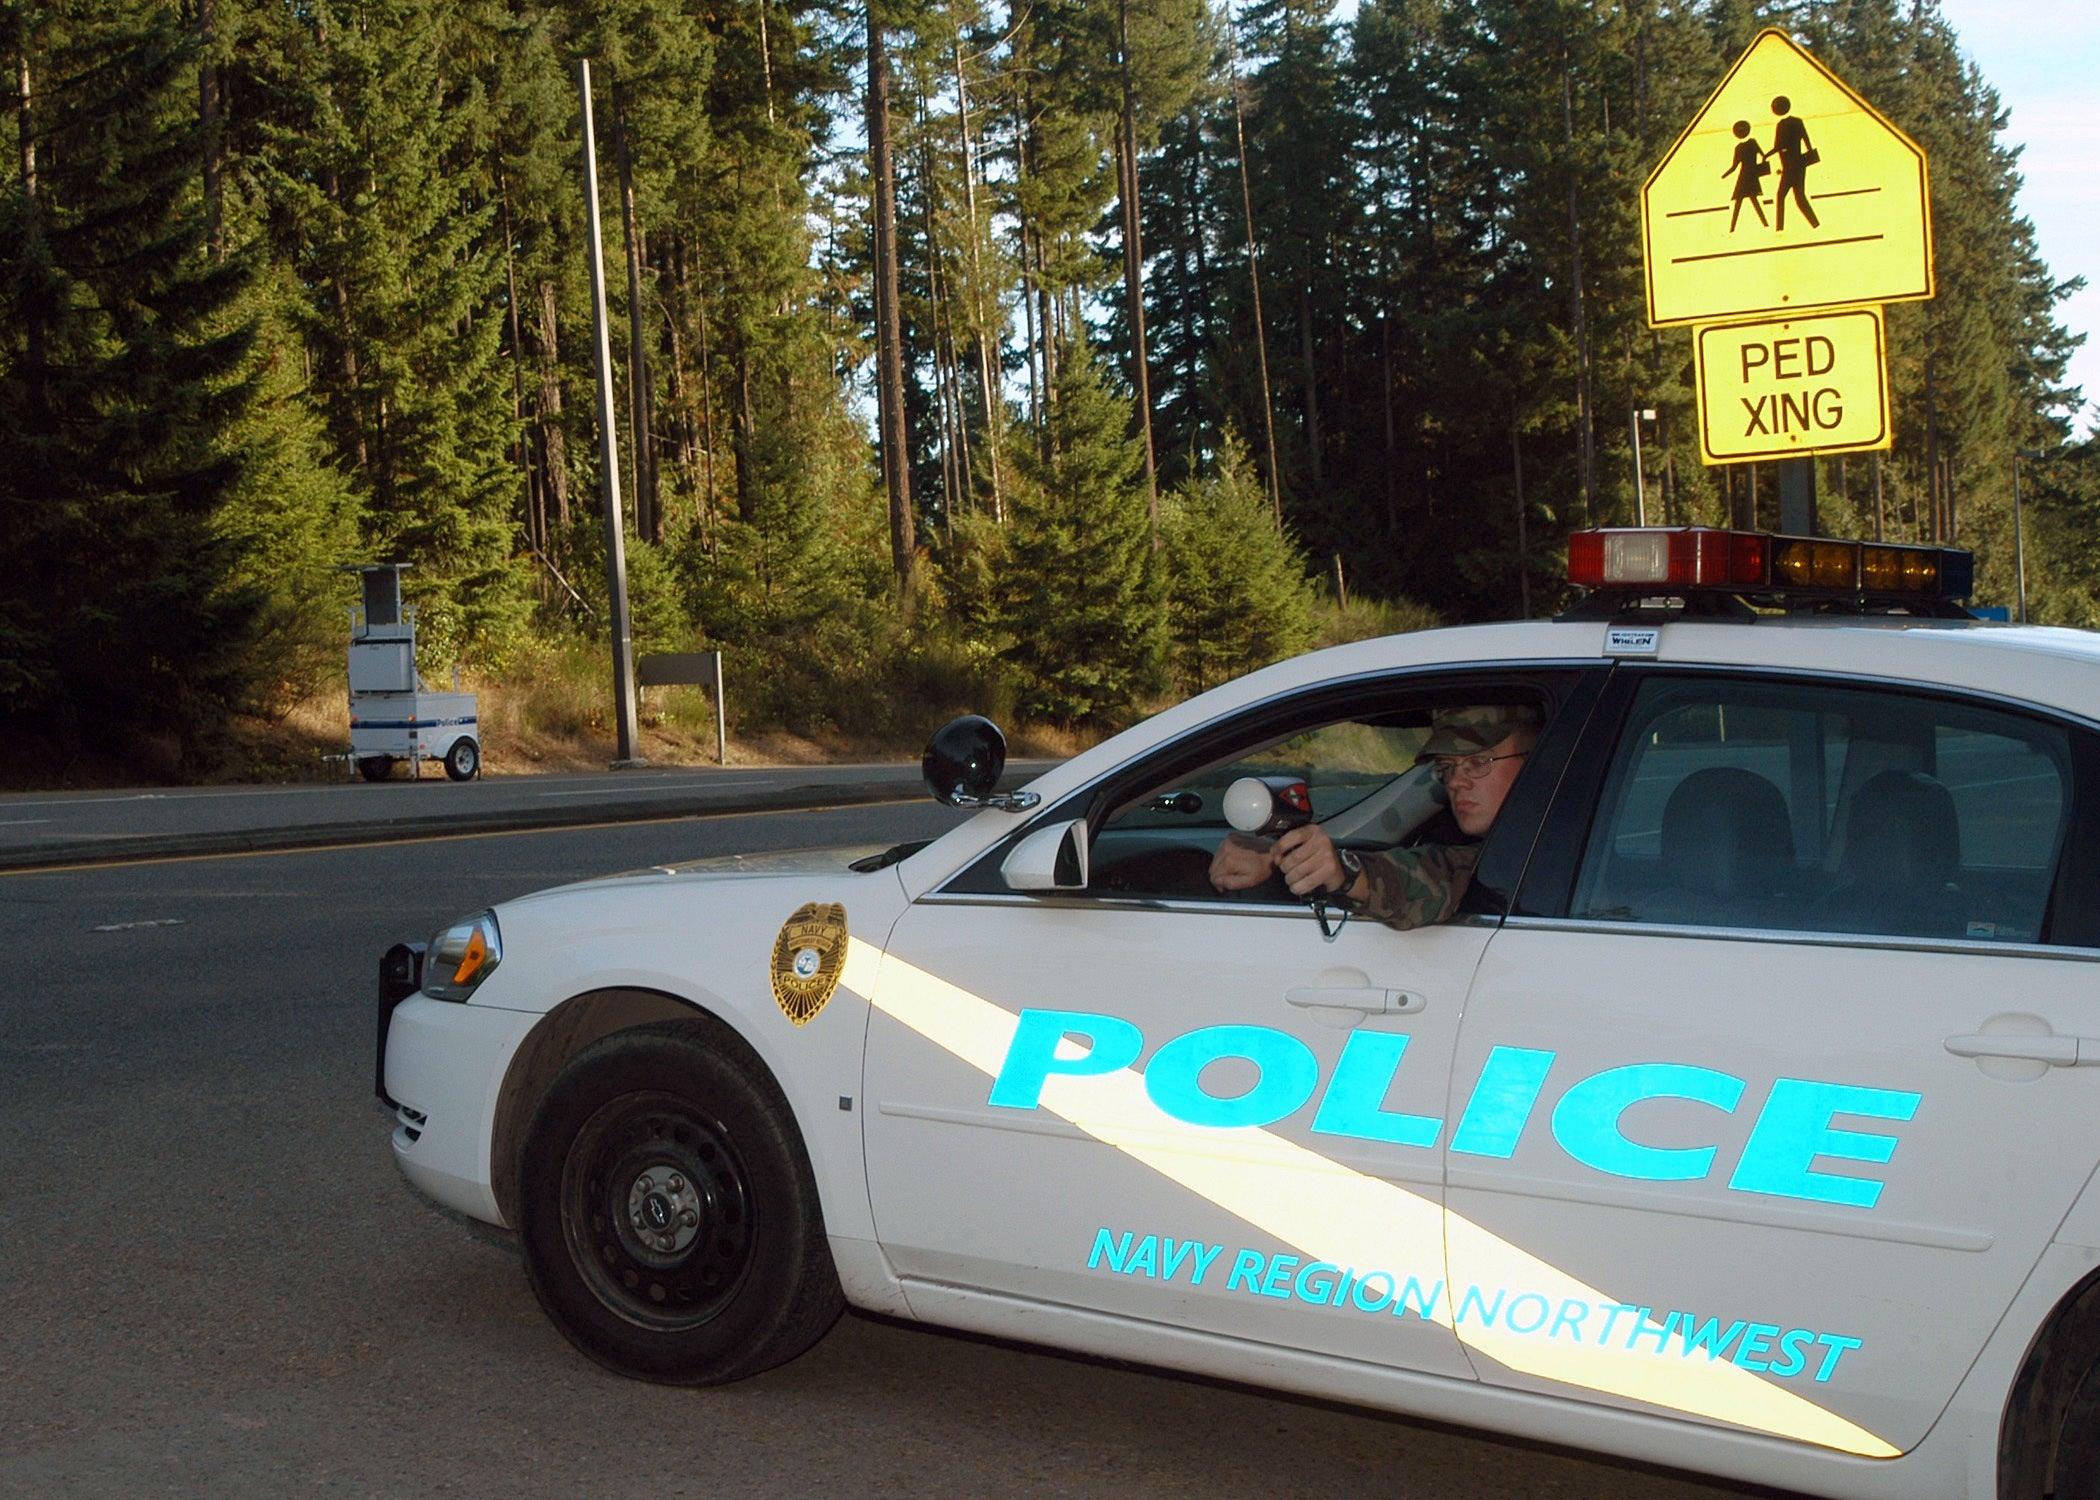 A New 'Radar Gun' May Spot Drivers Who Text Behind The Wheel